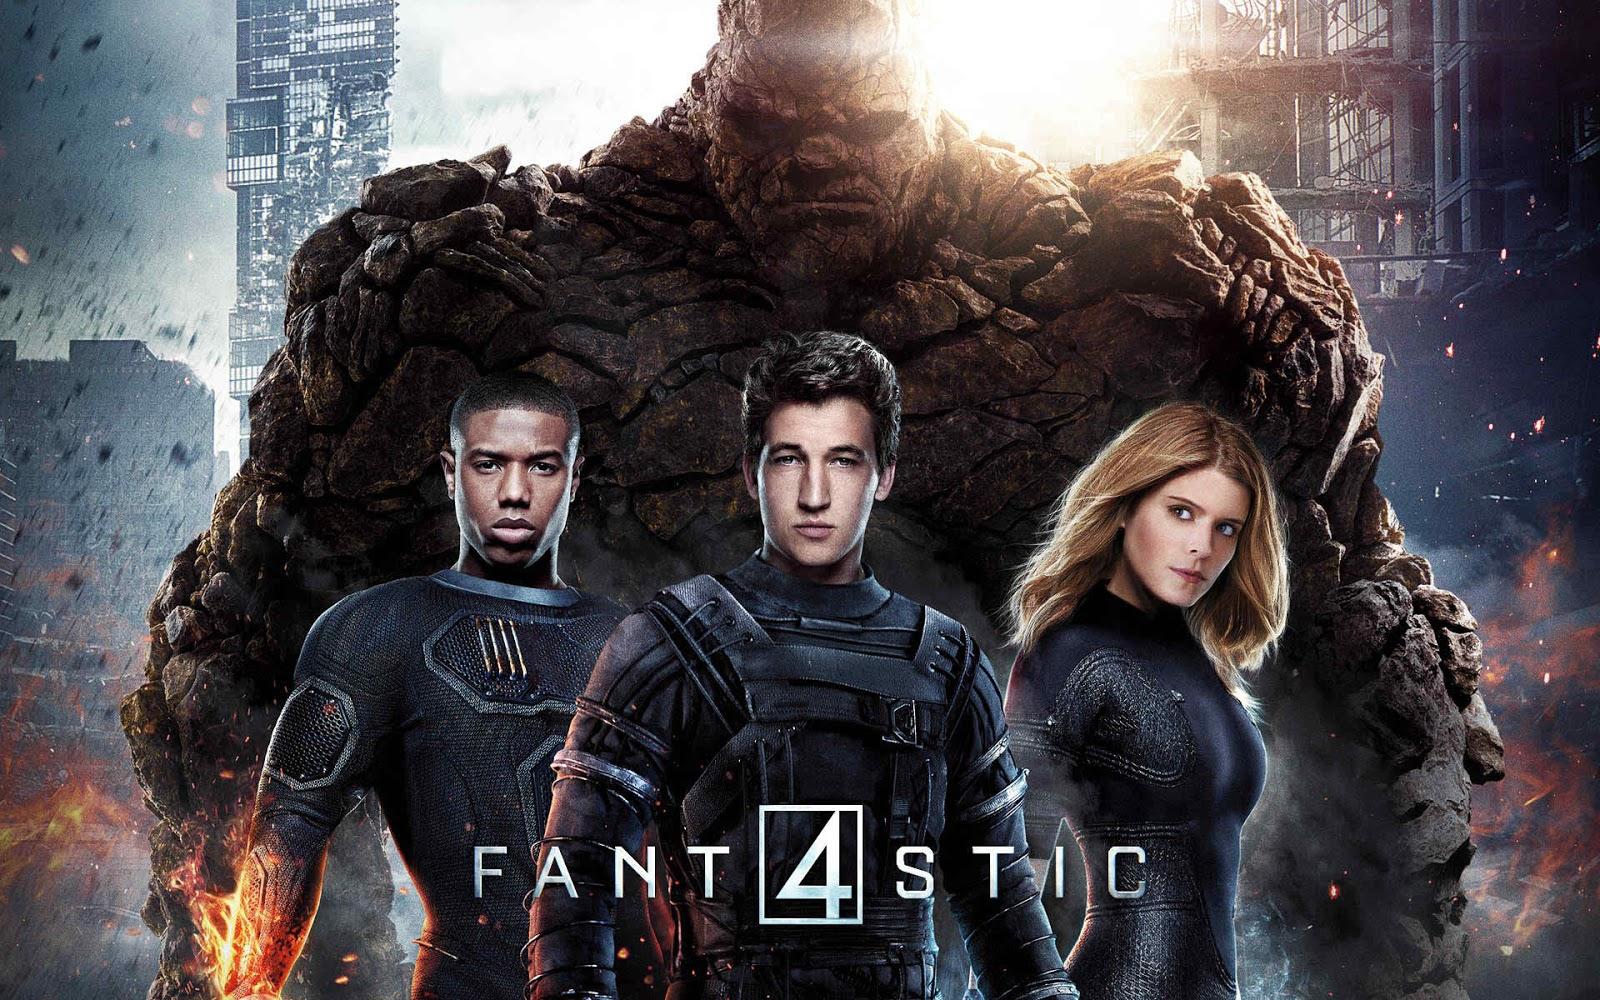 fantastic four download 2015